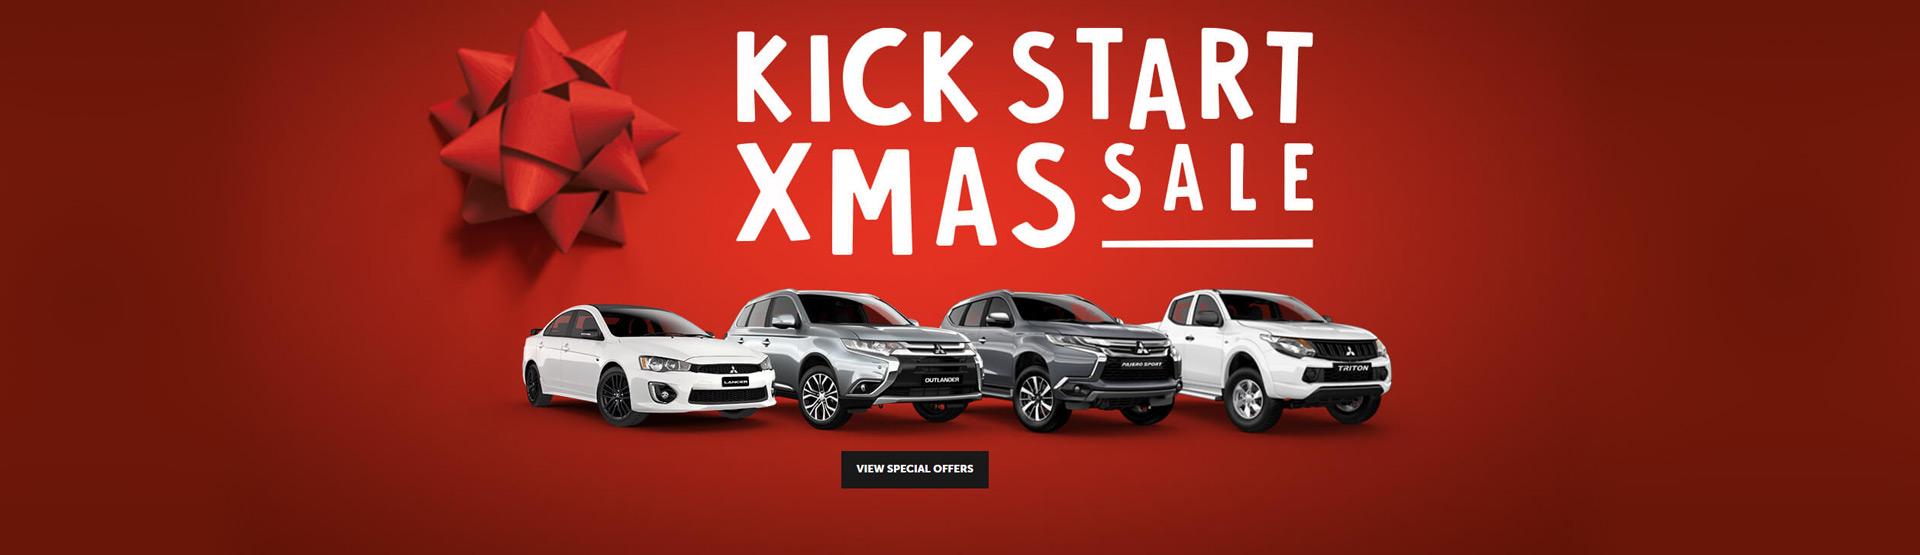 November Offer - Kickstart Xmas Sale